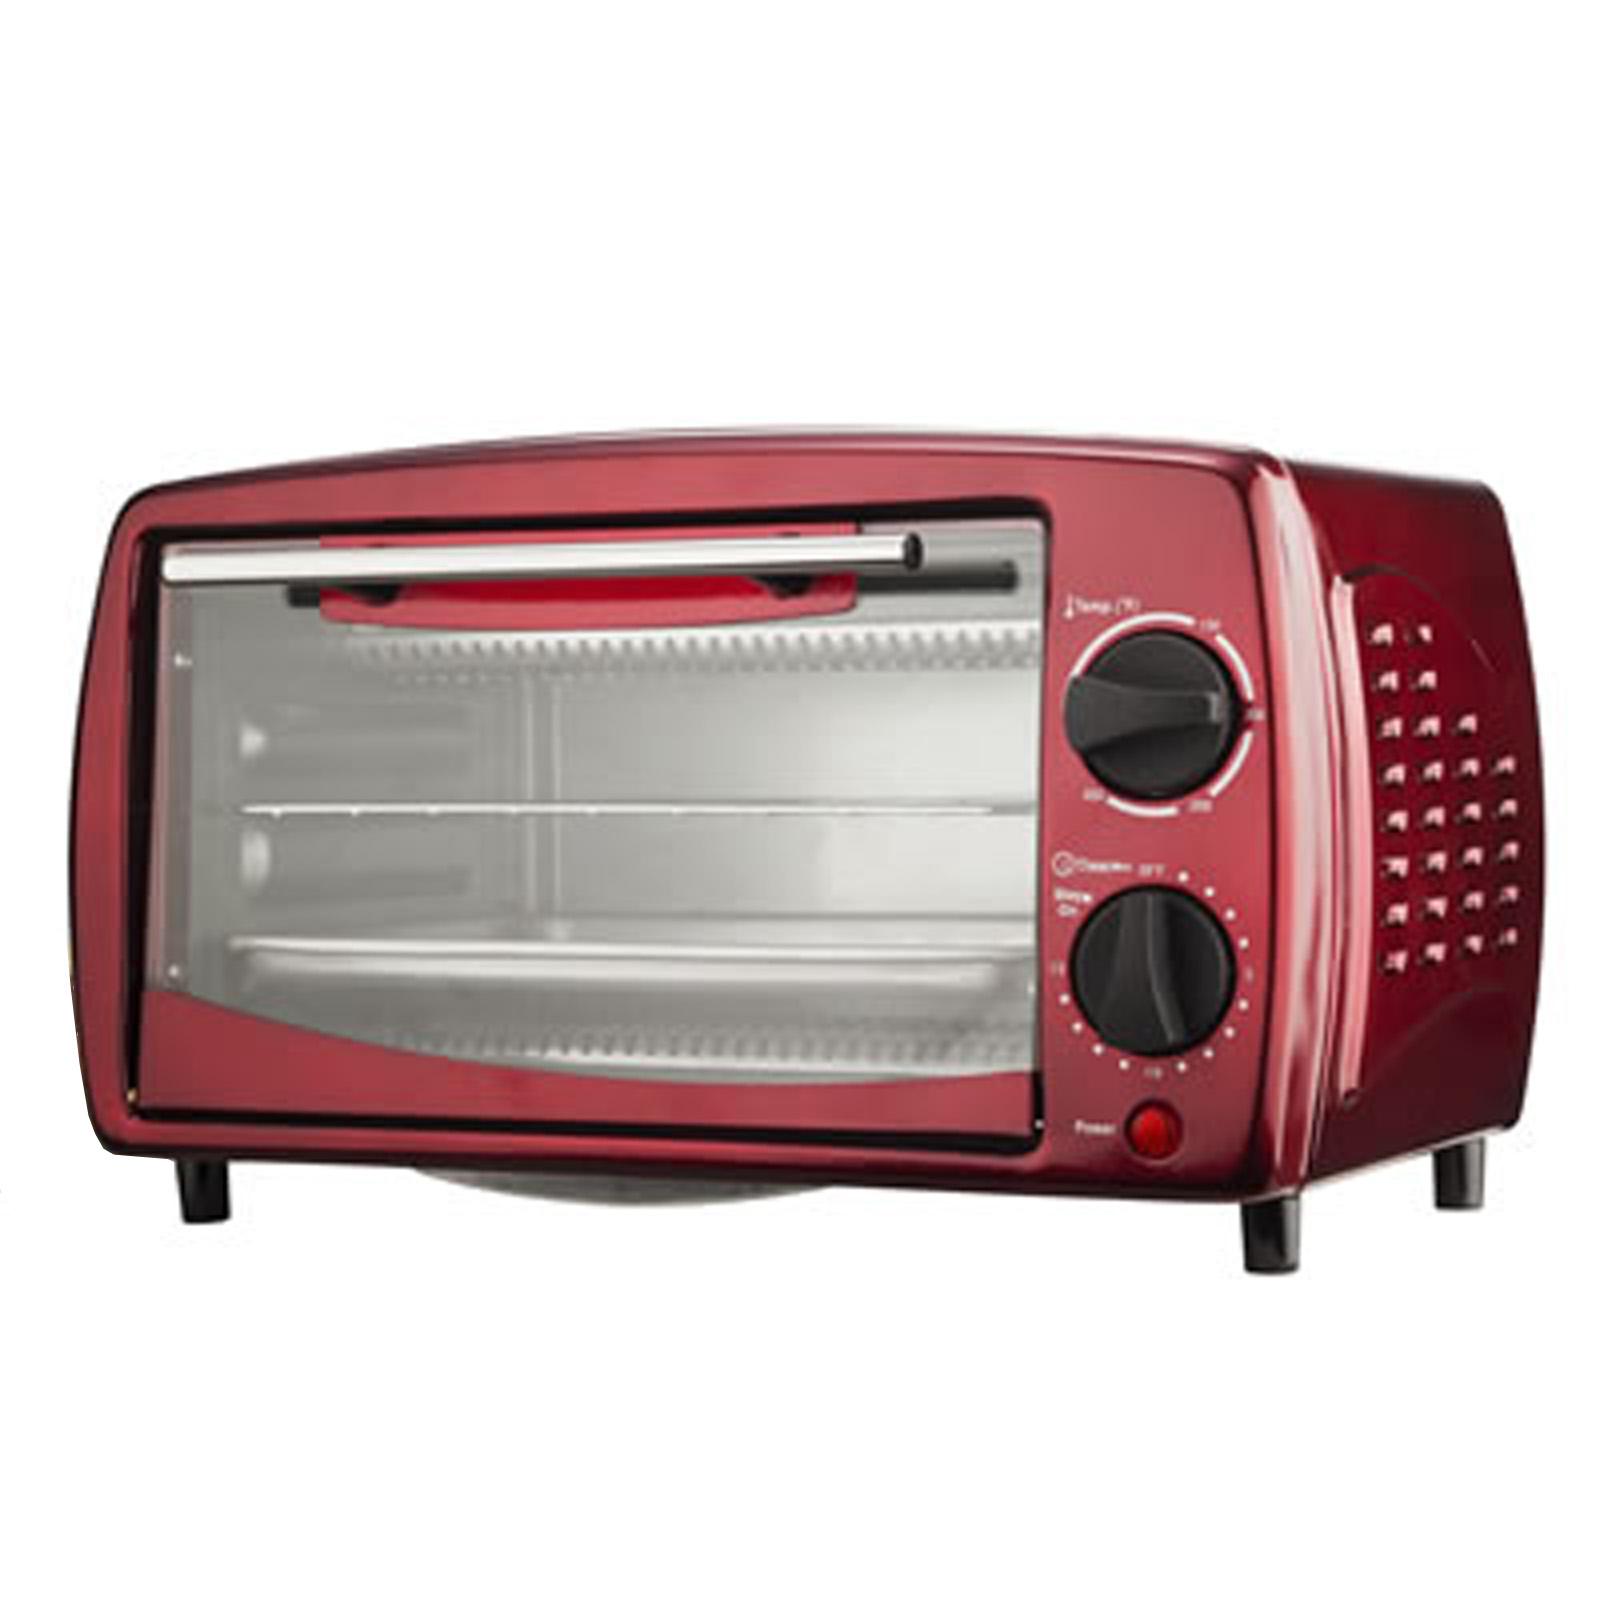 Brentwood 9-Liter (4 Slice) Toaster Oven Broiler (Red)